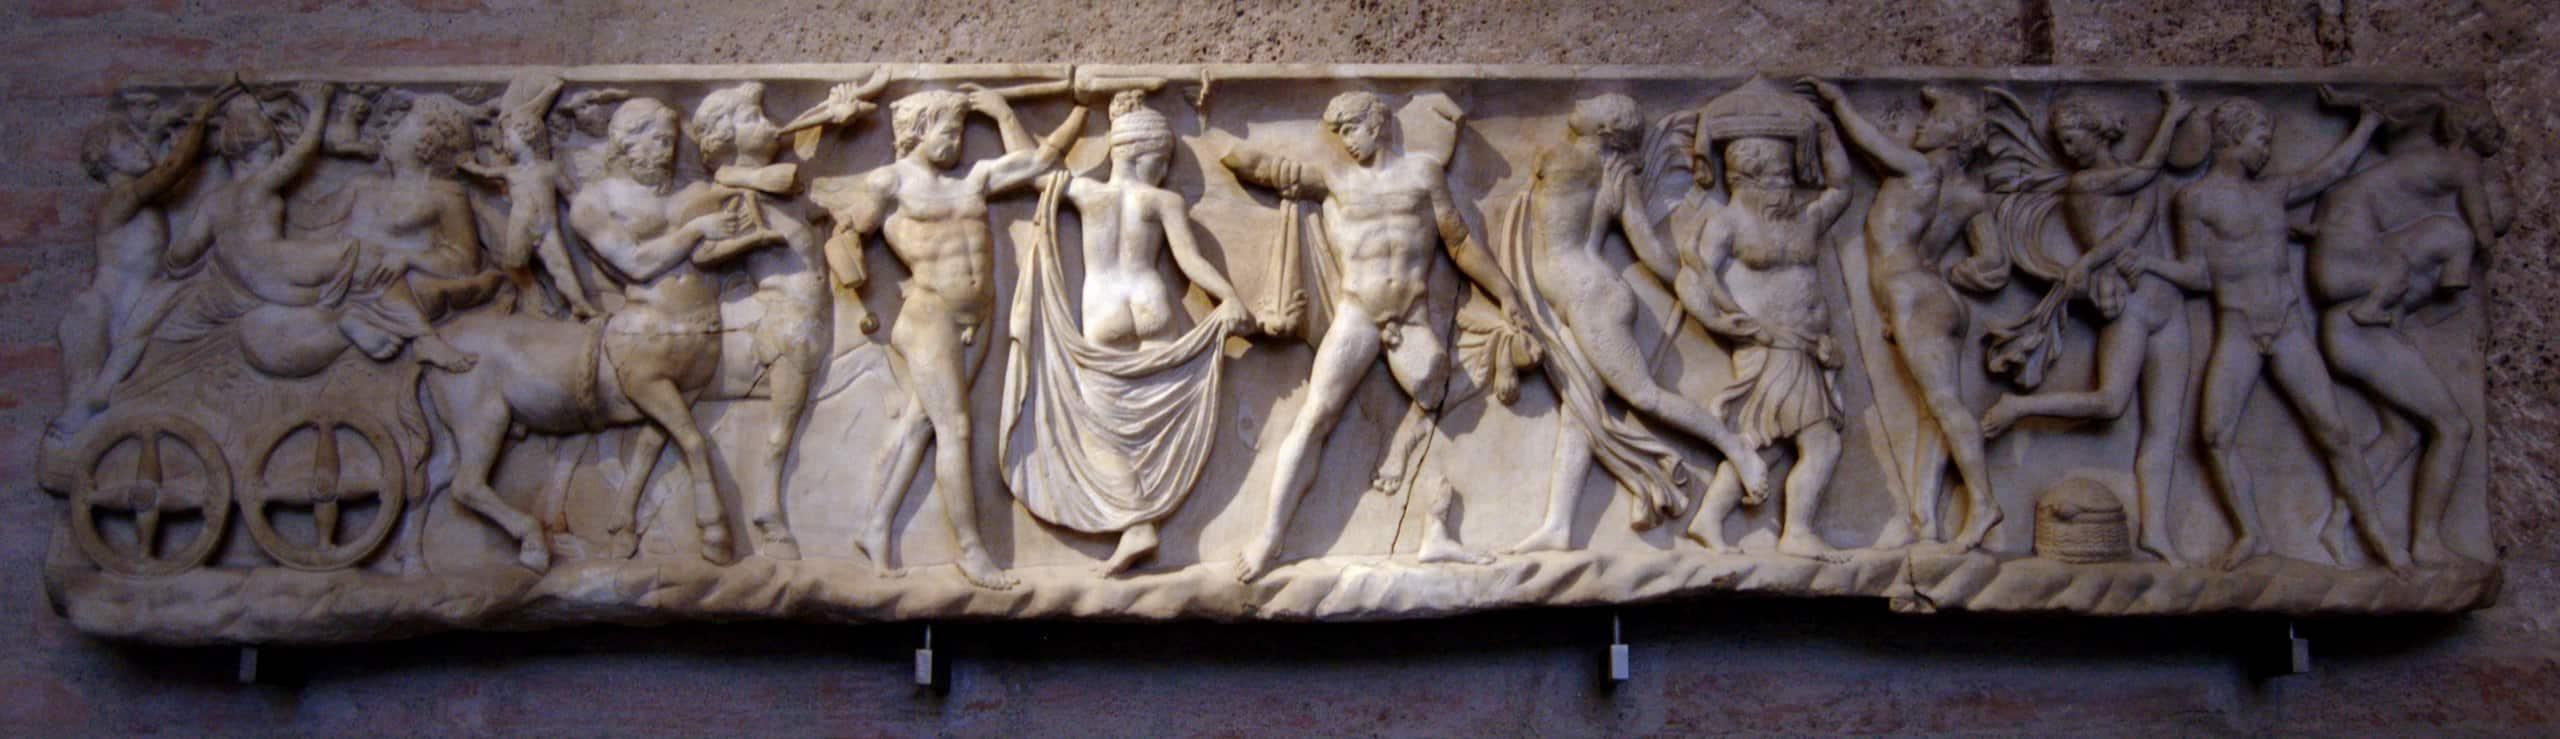 Dionizos ślub